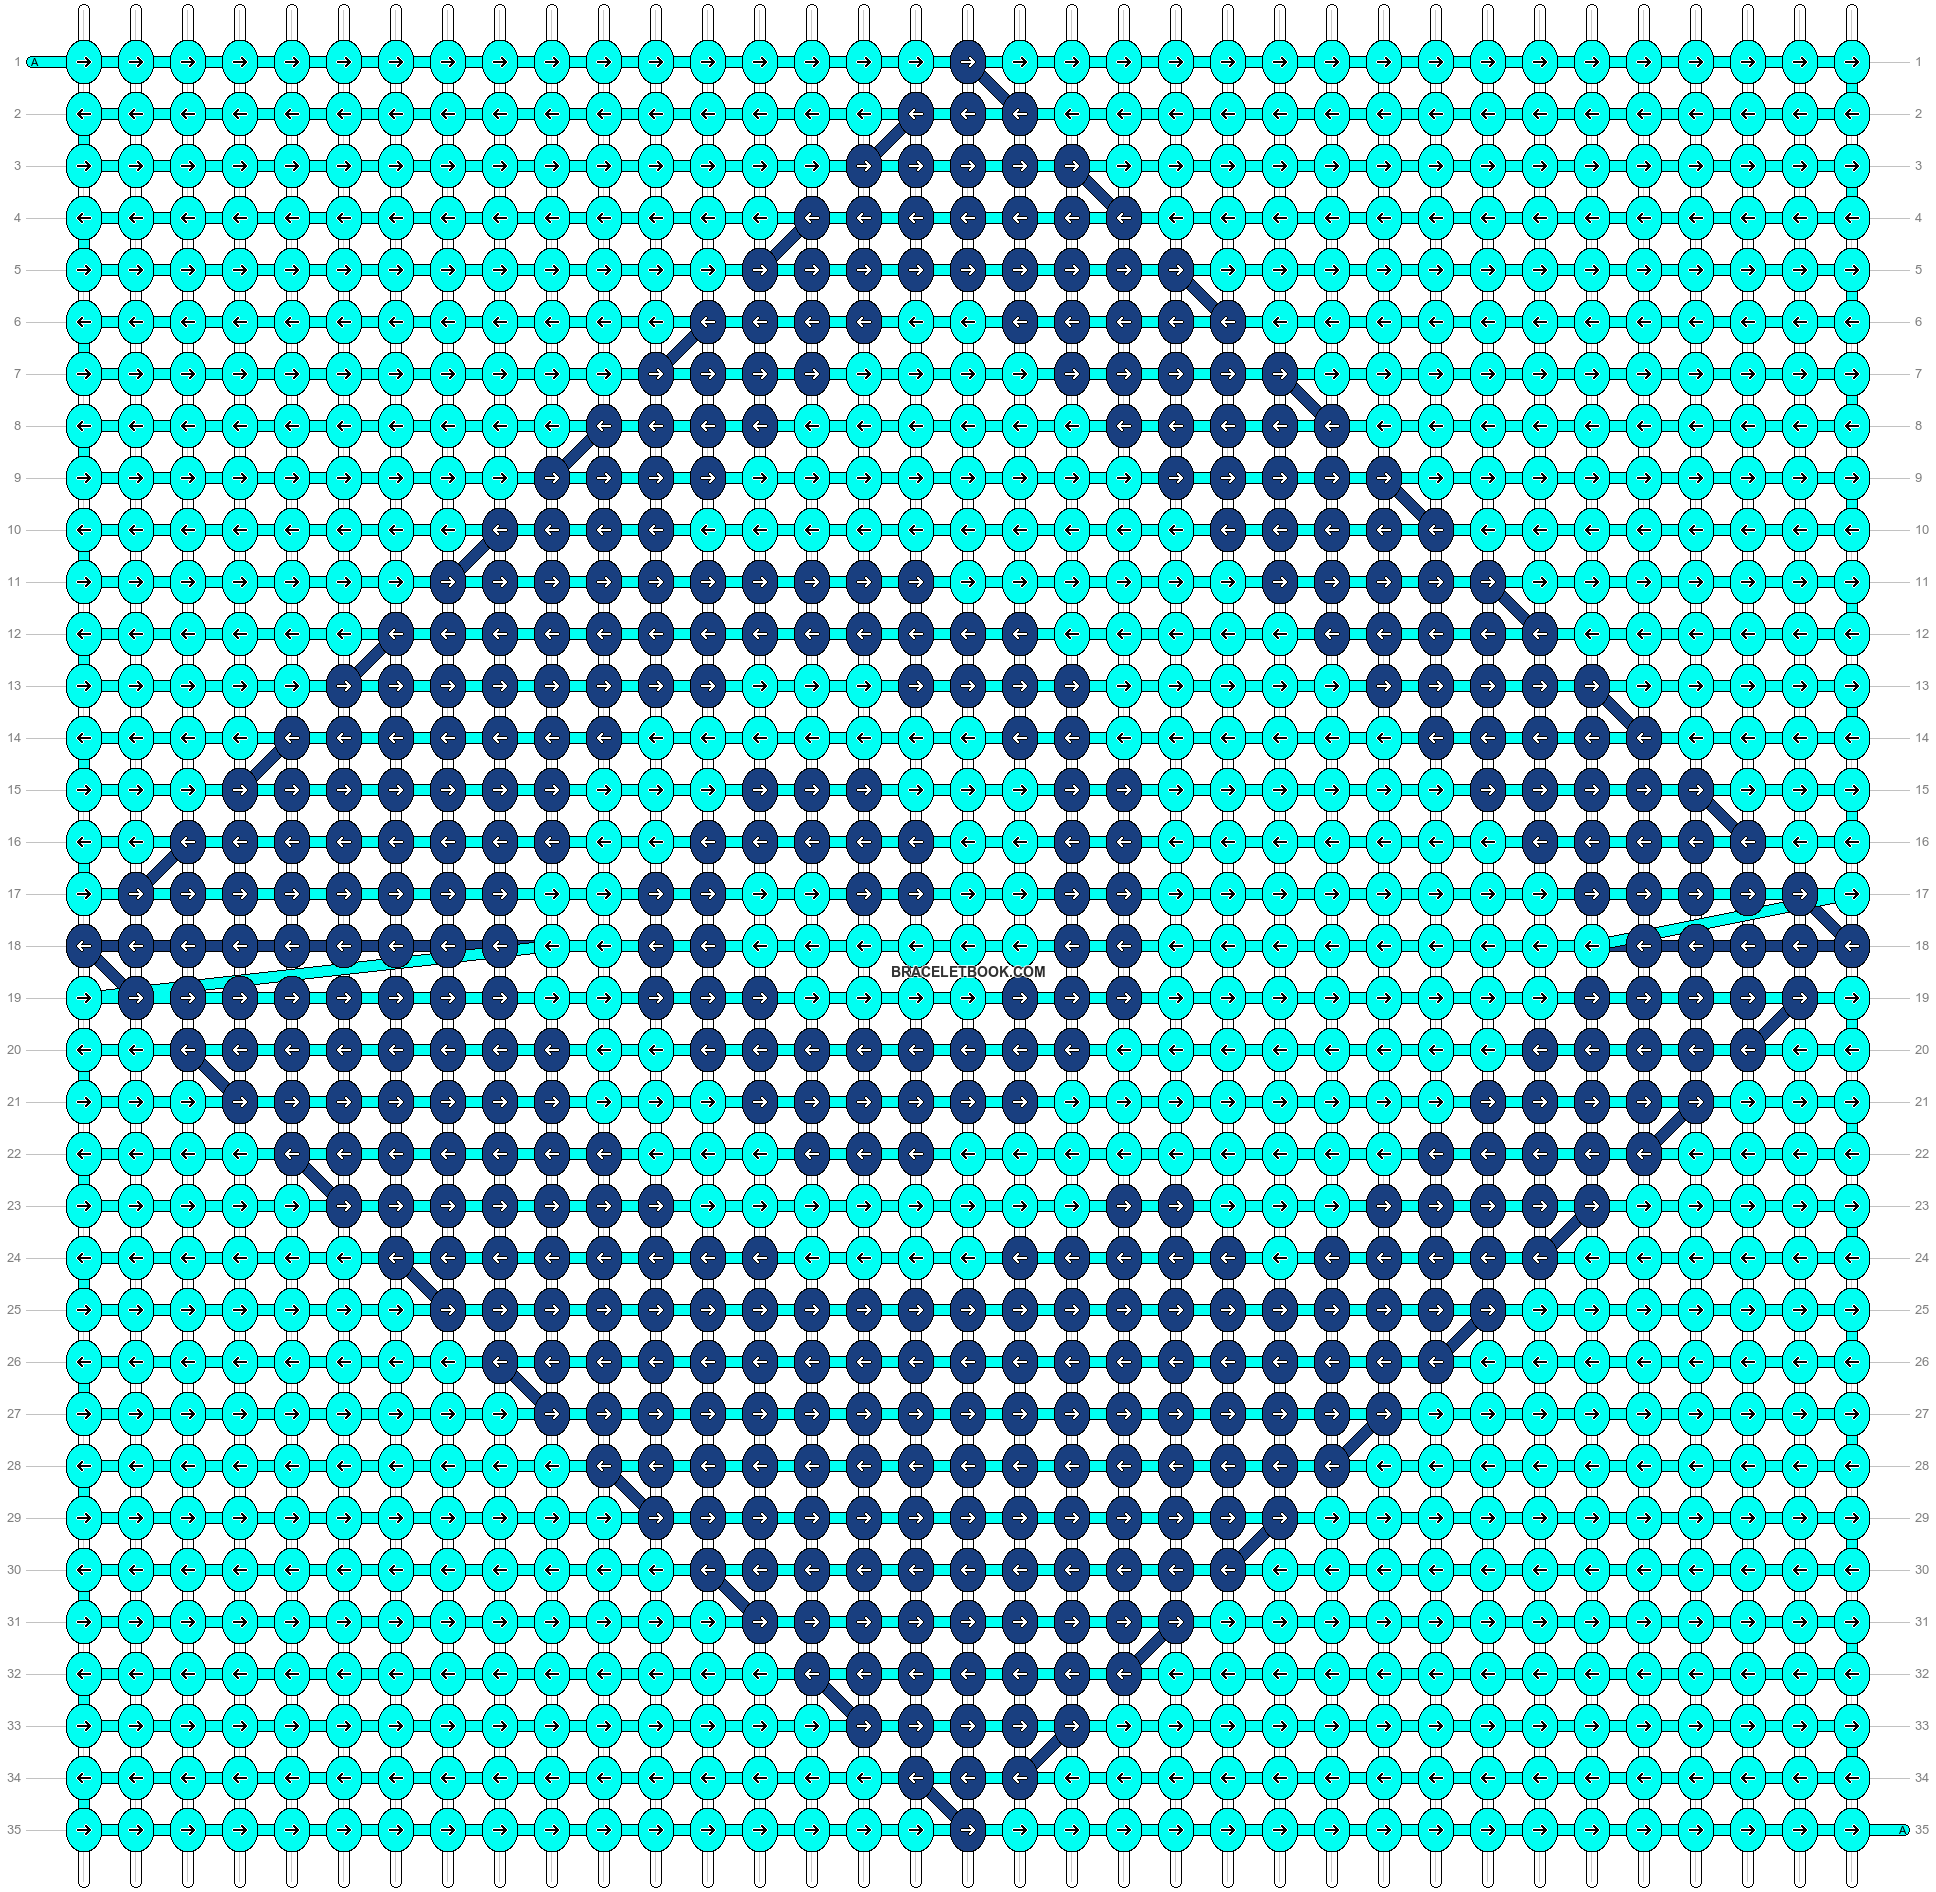 Alpha Pattern #22404 added by ValkyrieL